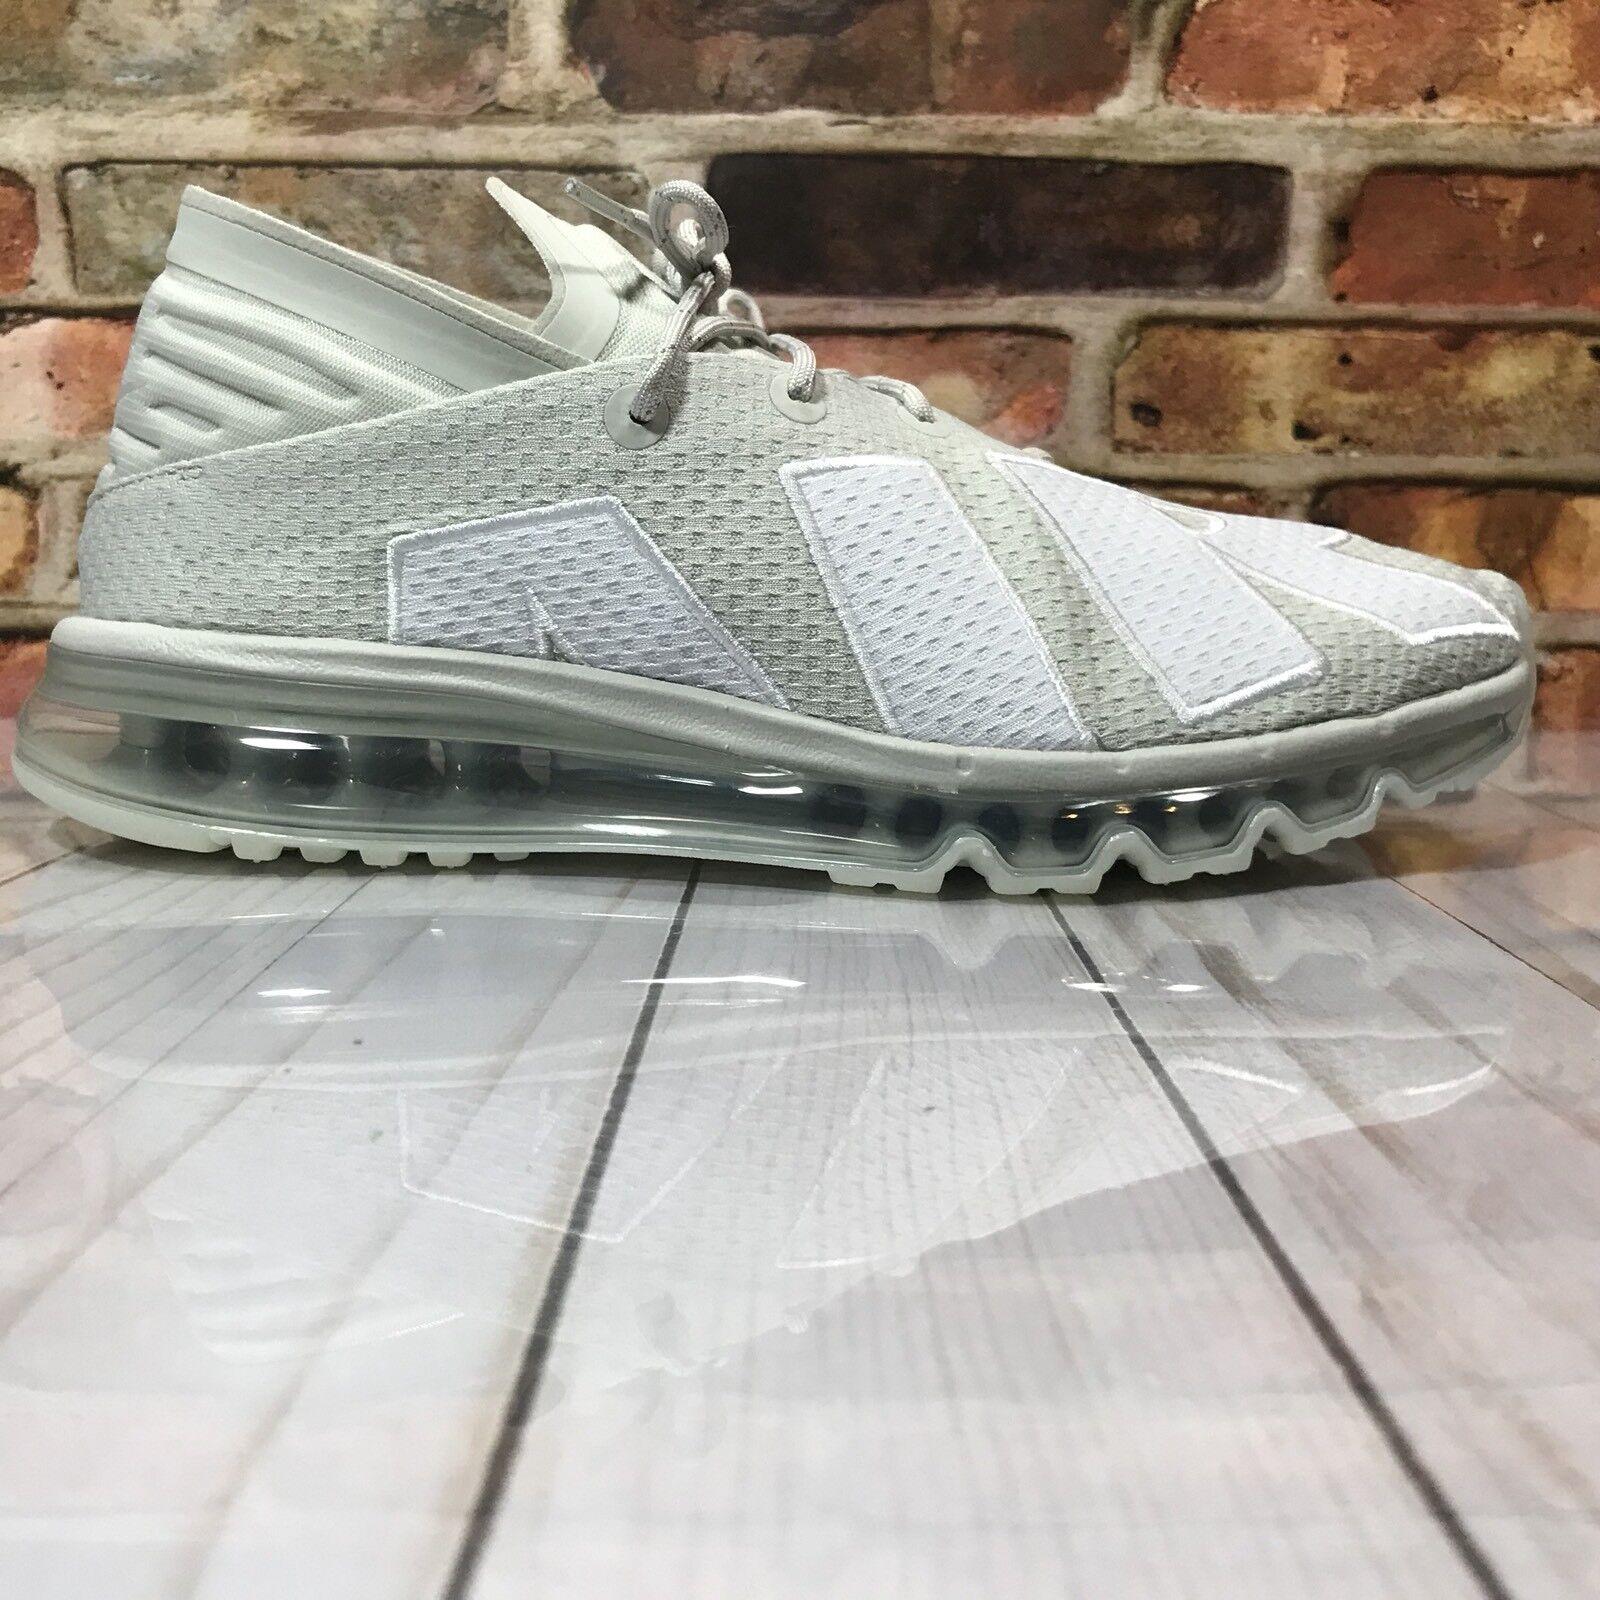 Nike Air Max Flair Herren Größe 10.5 Laufschuhe Hell Knochen Knochen Knochen Weiß Grau e7fc6d